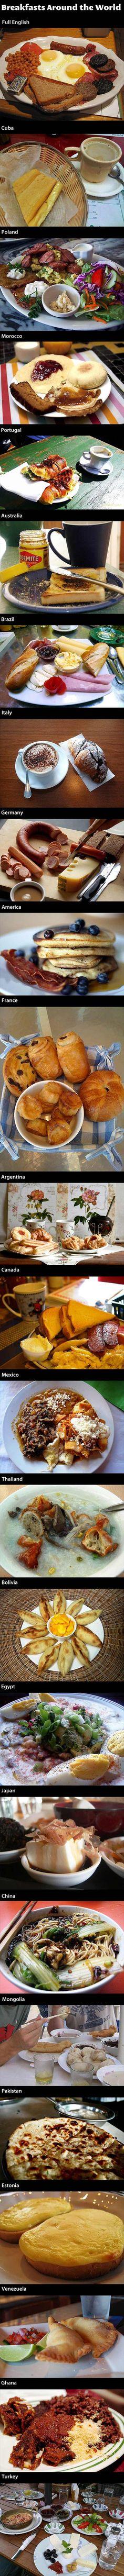 Breakfasts around the world.